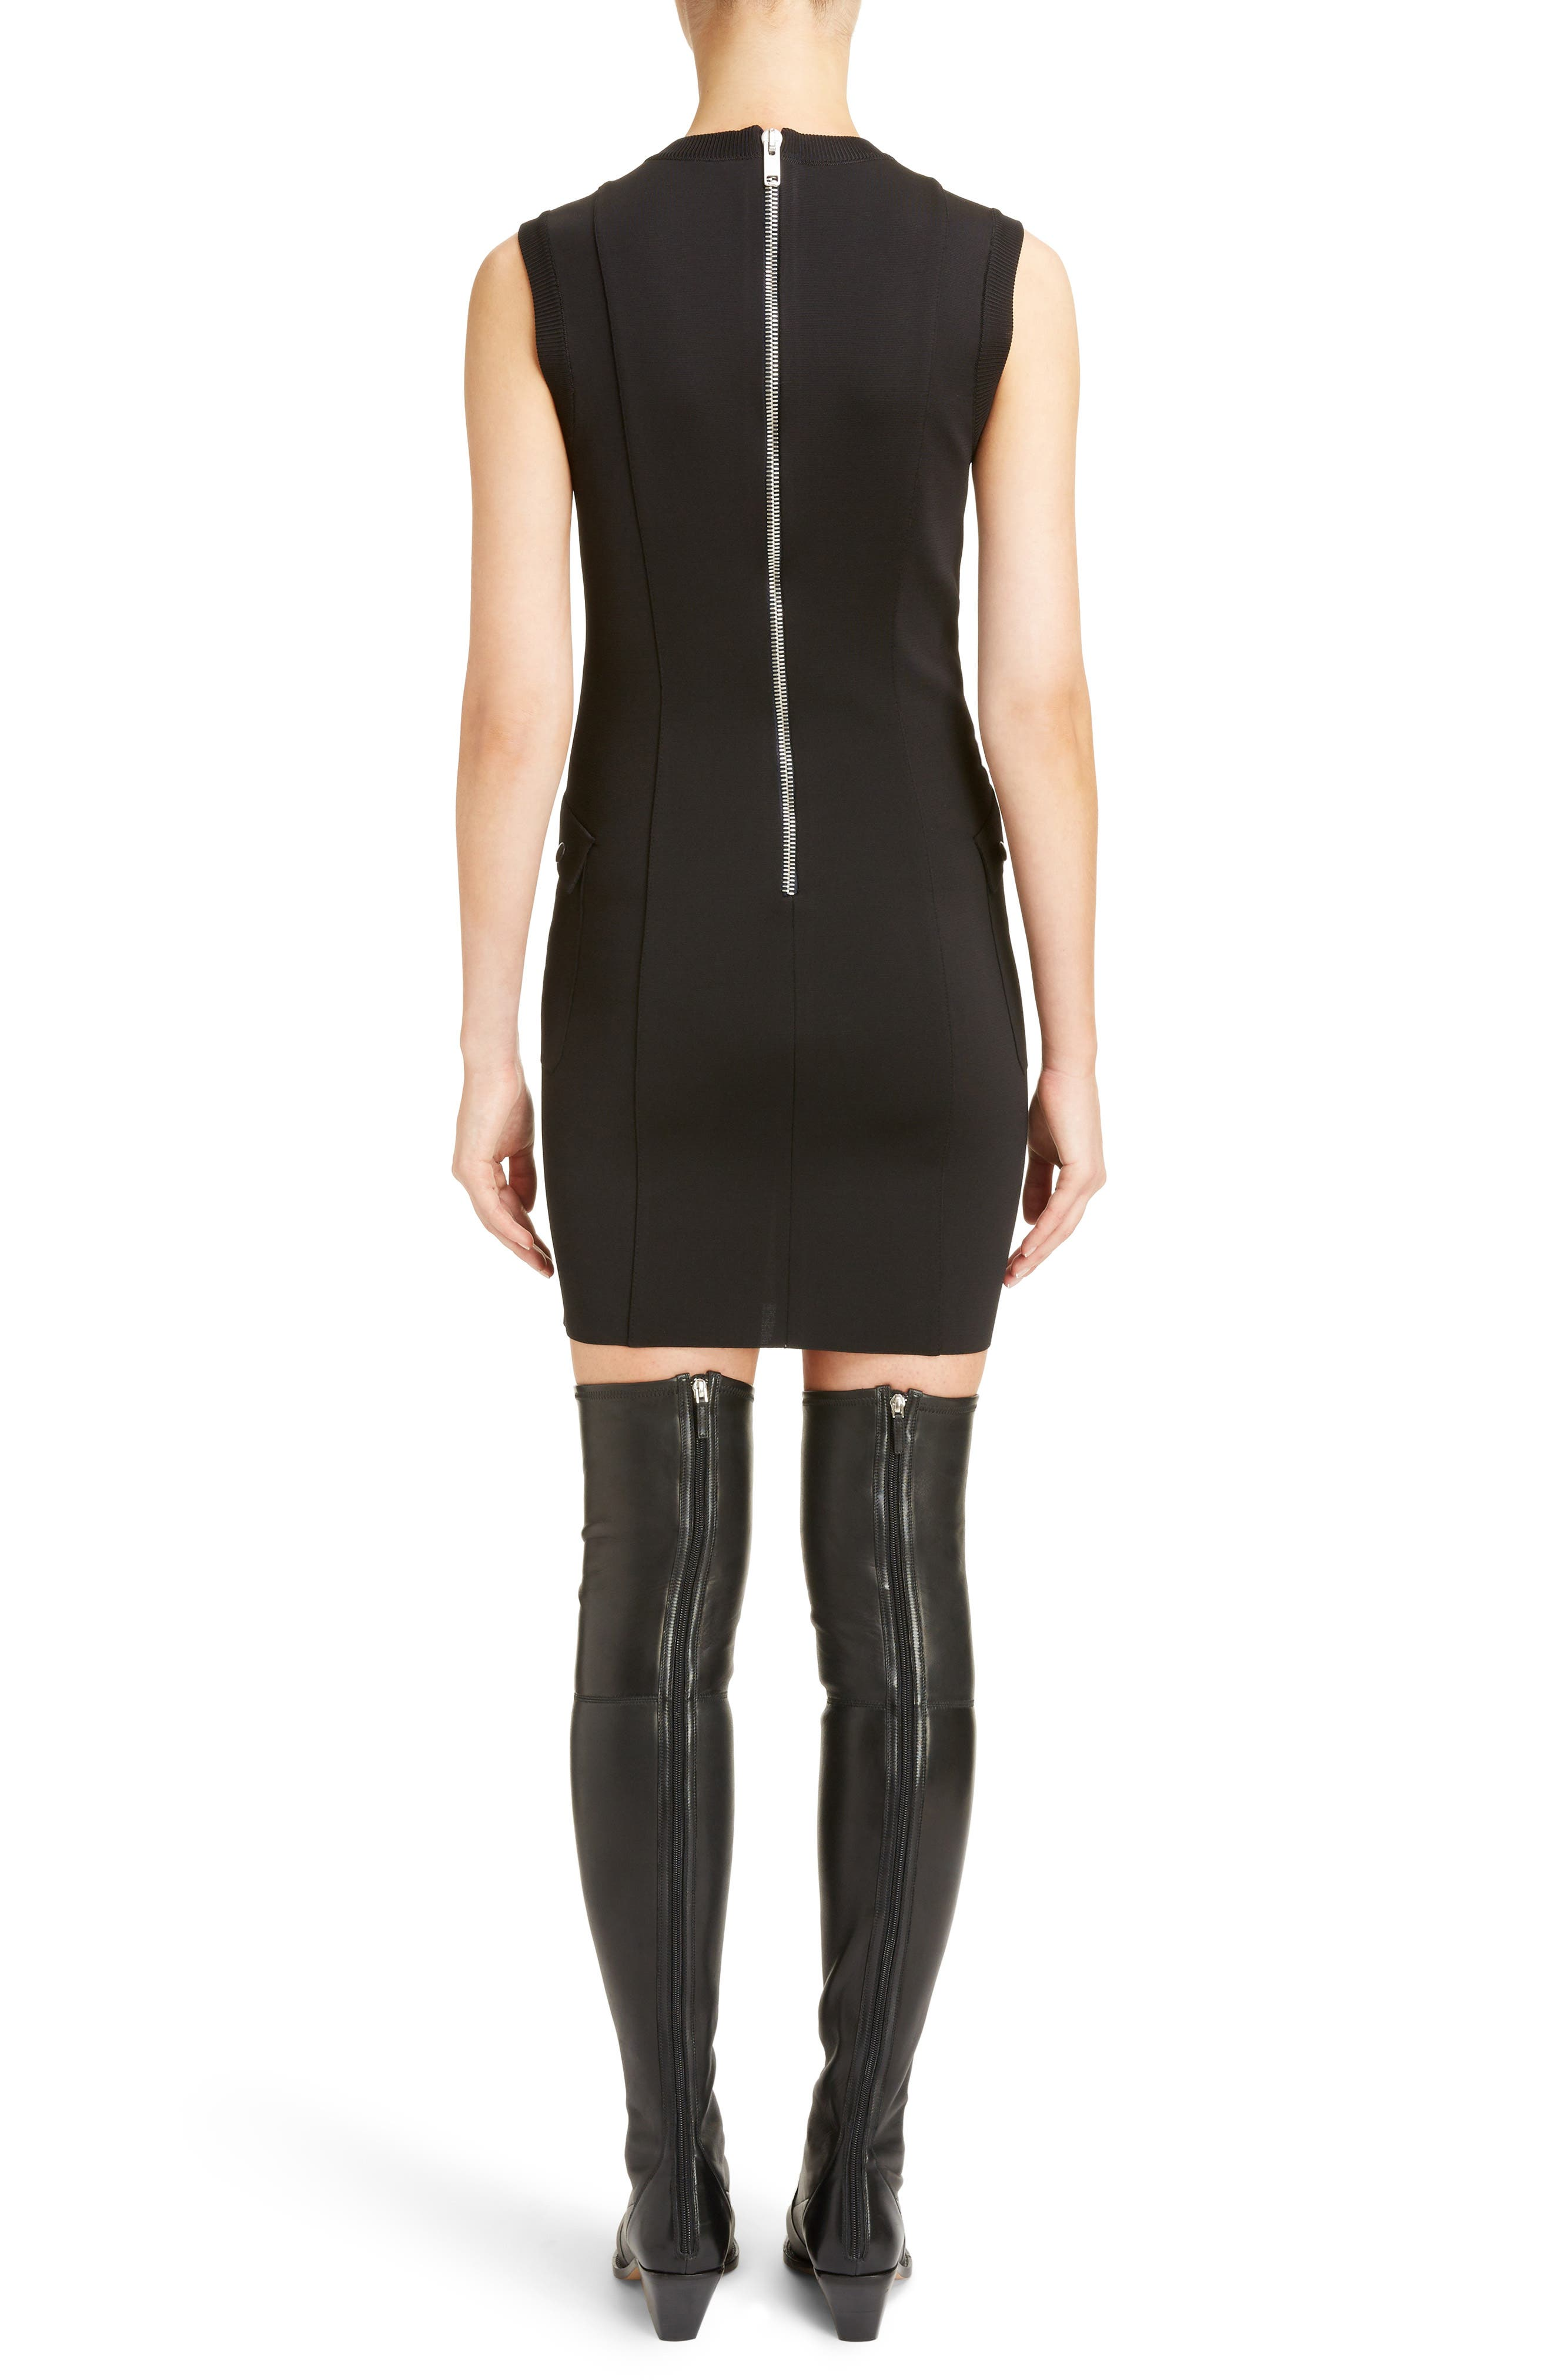 Two-Tone Punto Milano Dress,                             Alternate thumbnail 2, color,                             BLACK/ WHITE